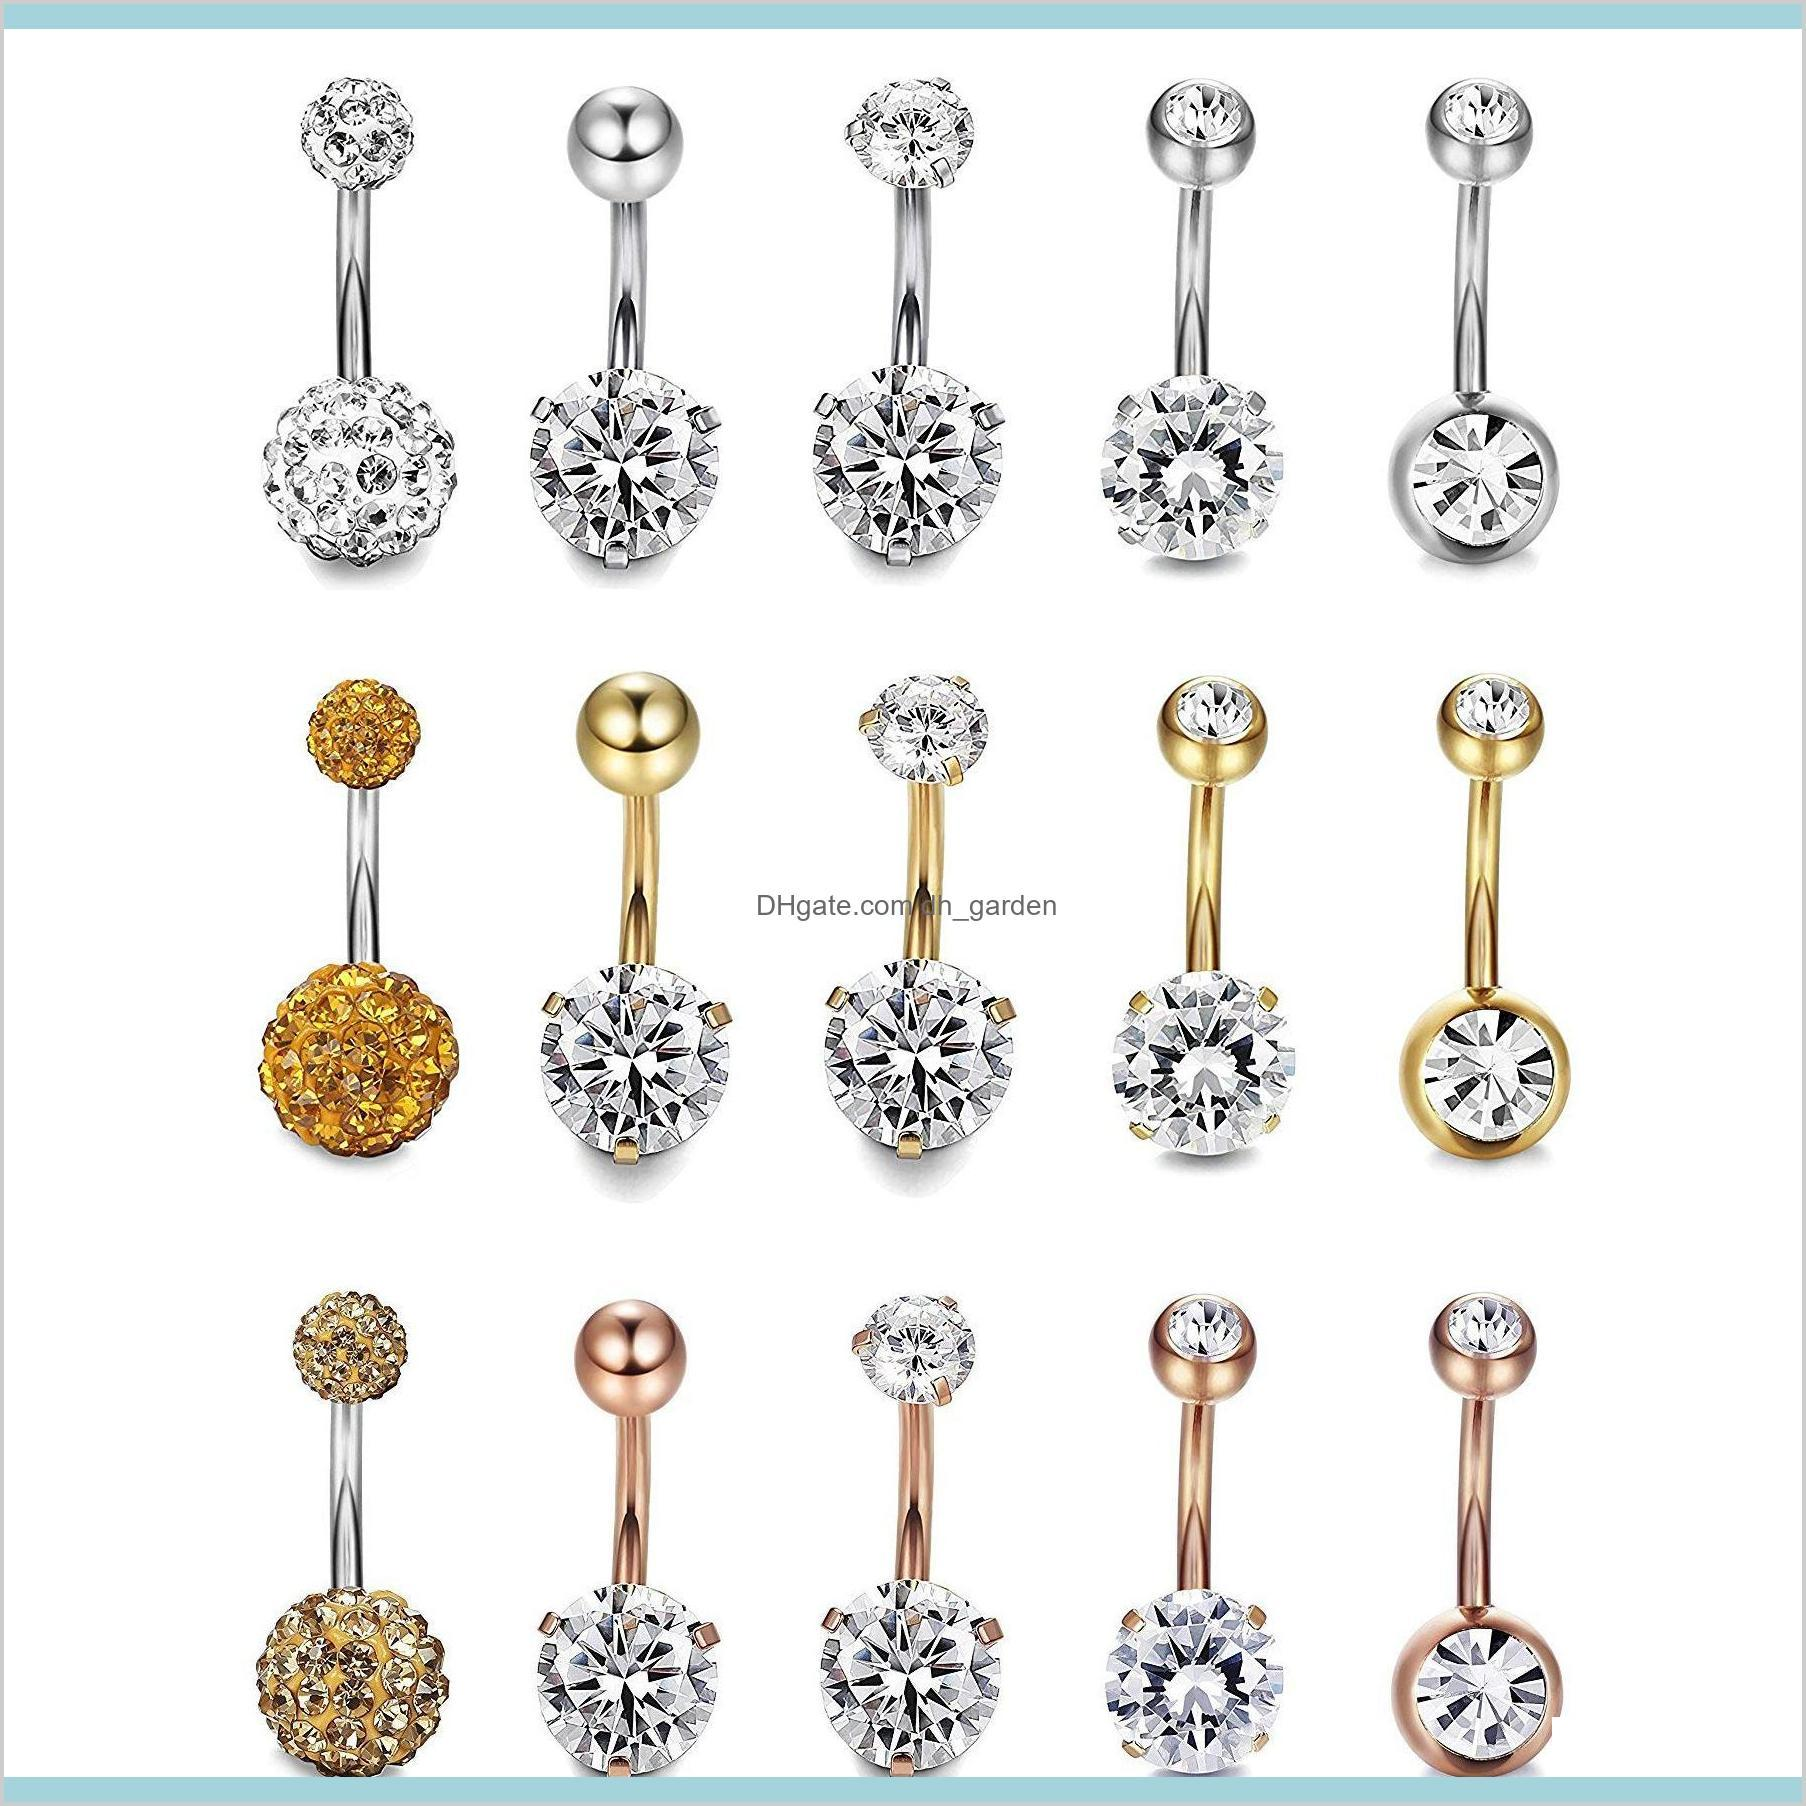 5Pcsset Round Love Heart Cute Crystal Body Jewelry Piercings Stainless Steel Rhinestone Piercing For Women Pakfa Q8Bc2